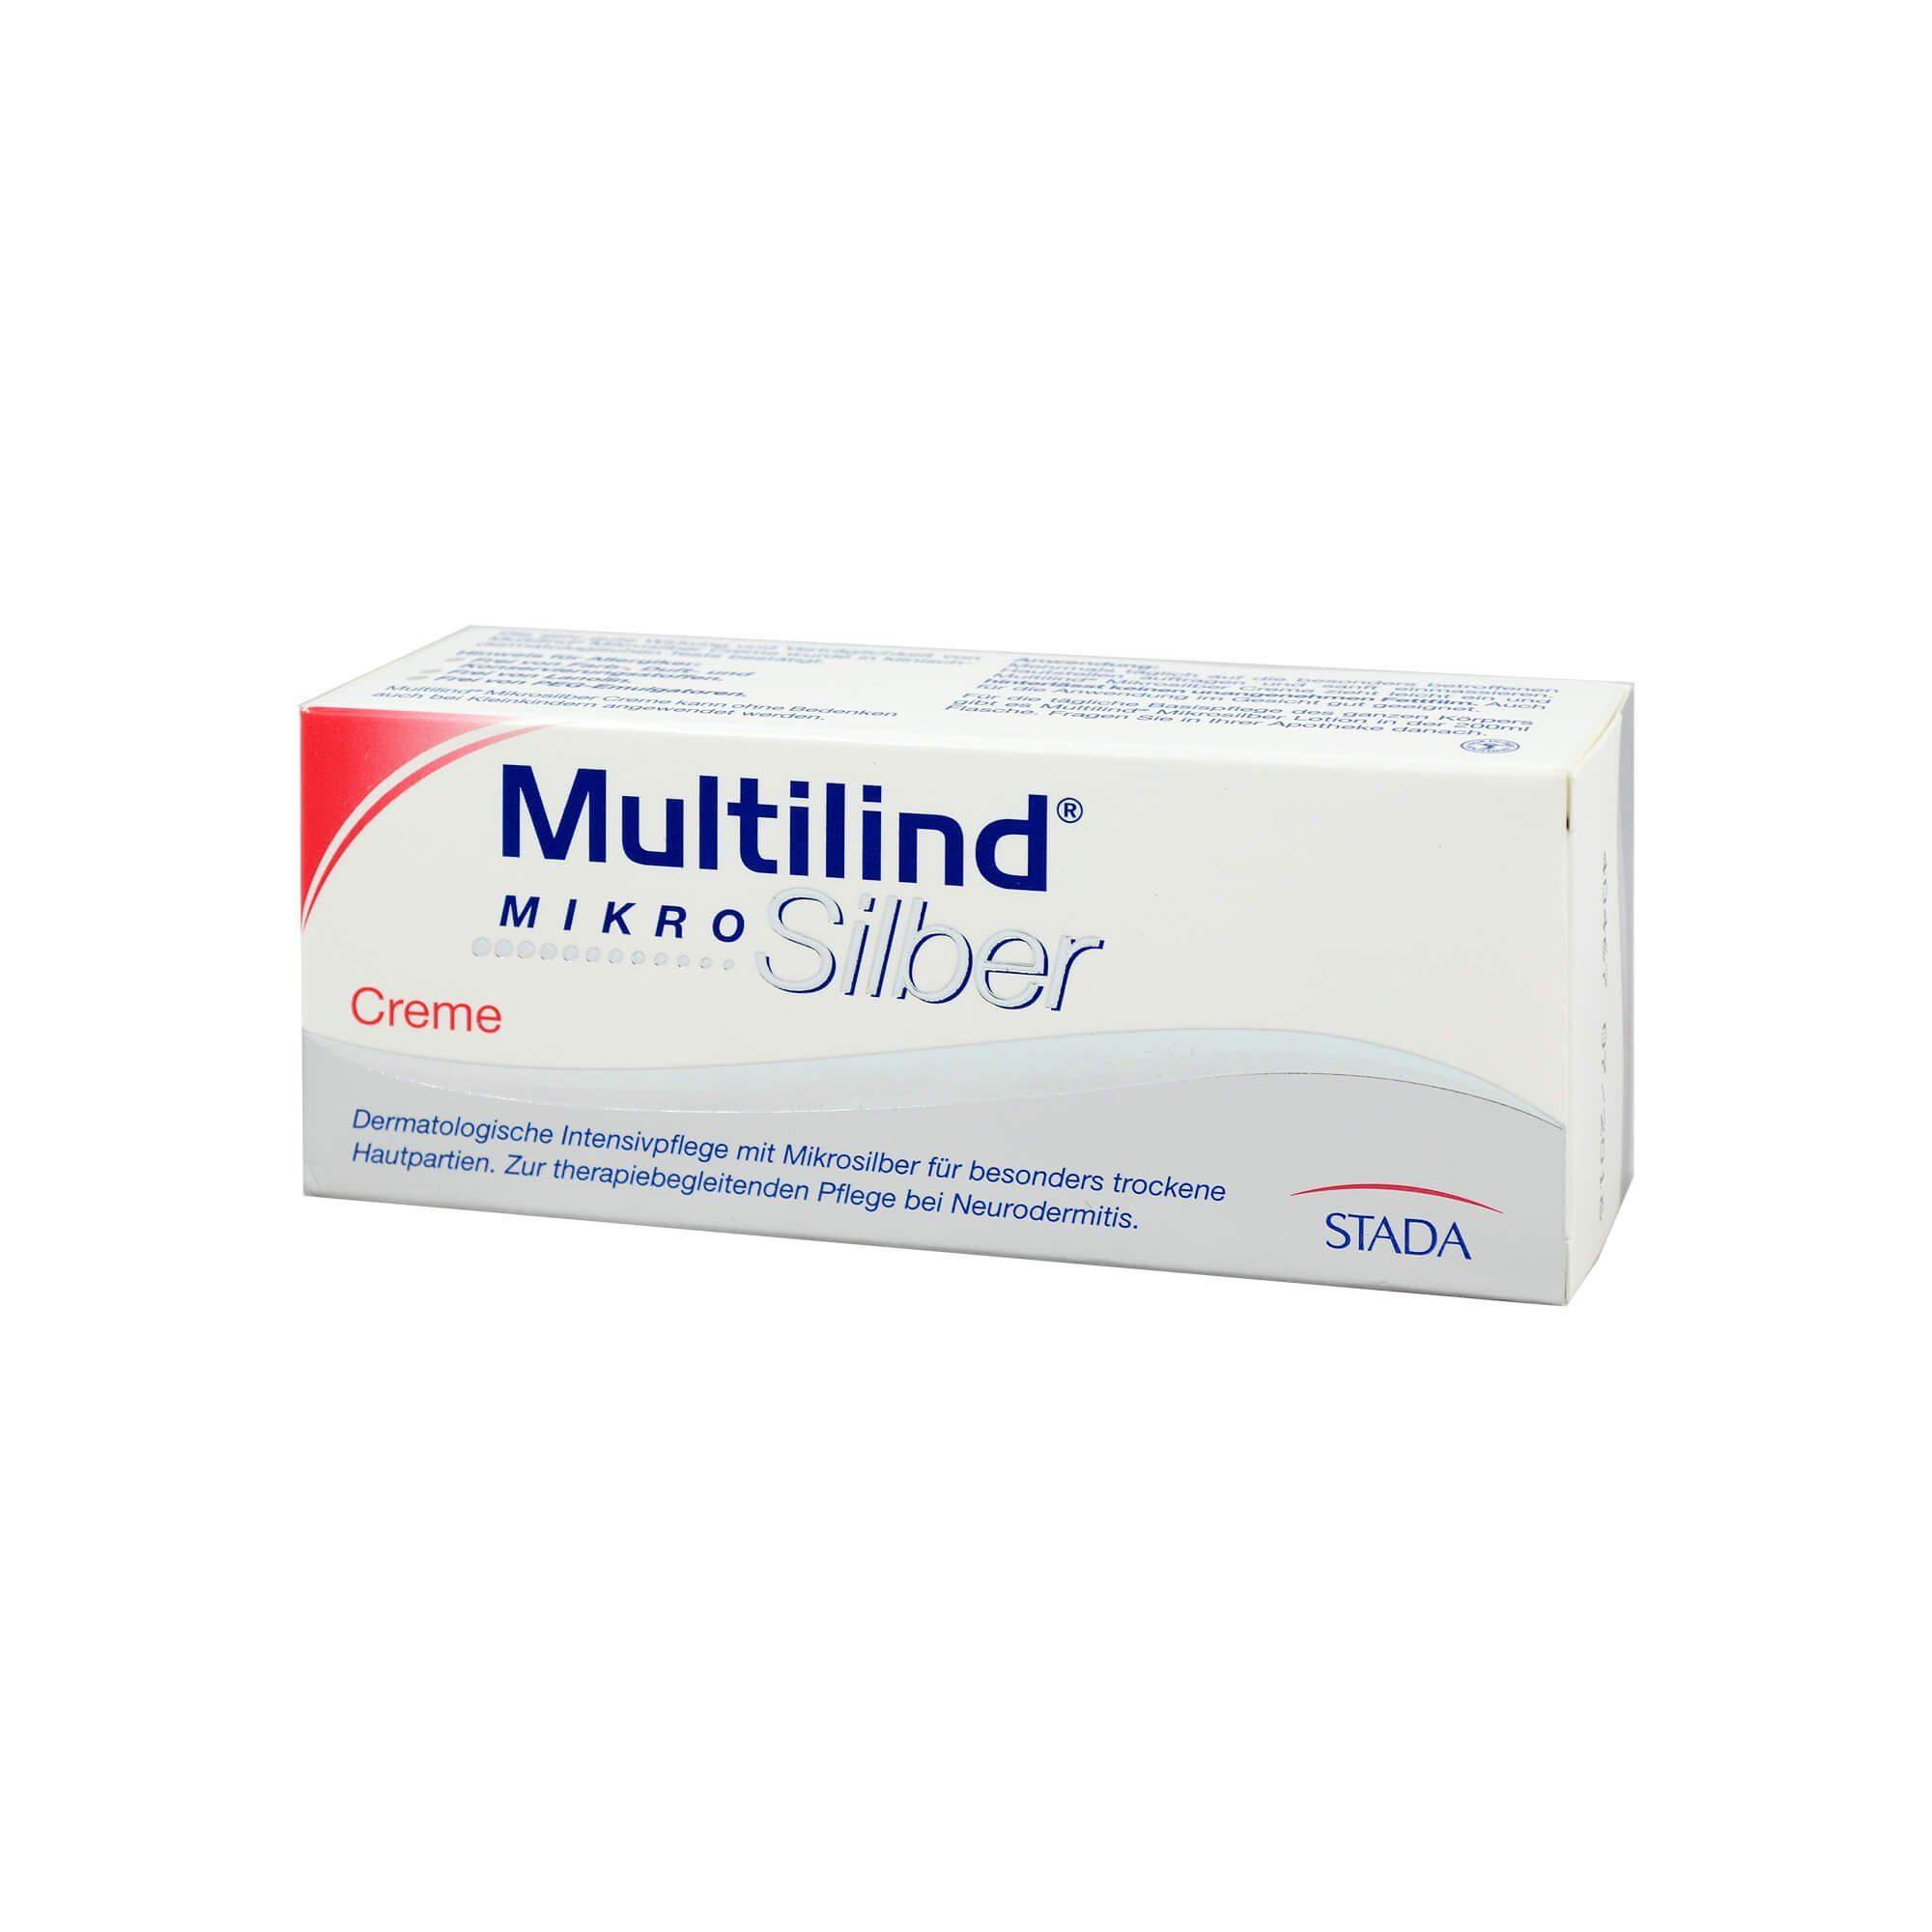 Multilind Mikrosilber Creme, 75 ml